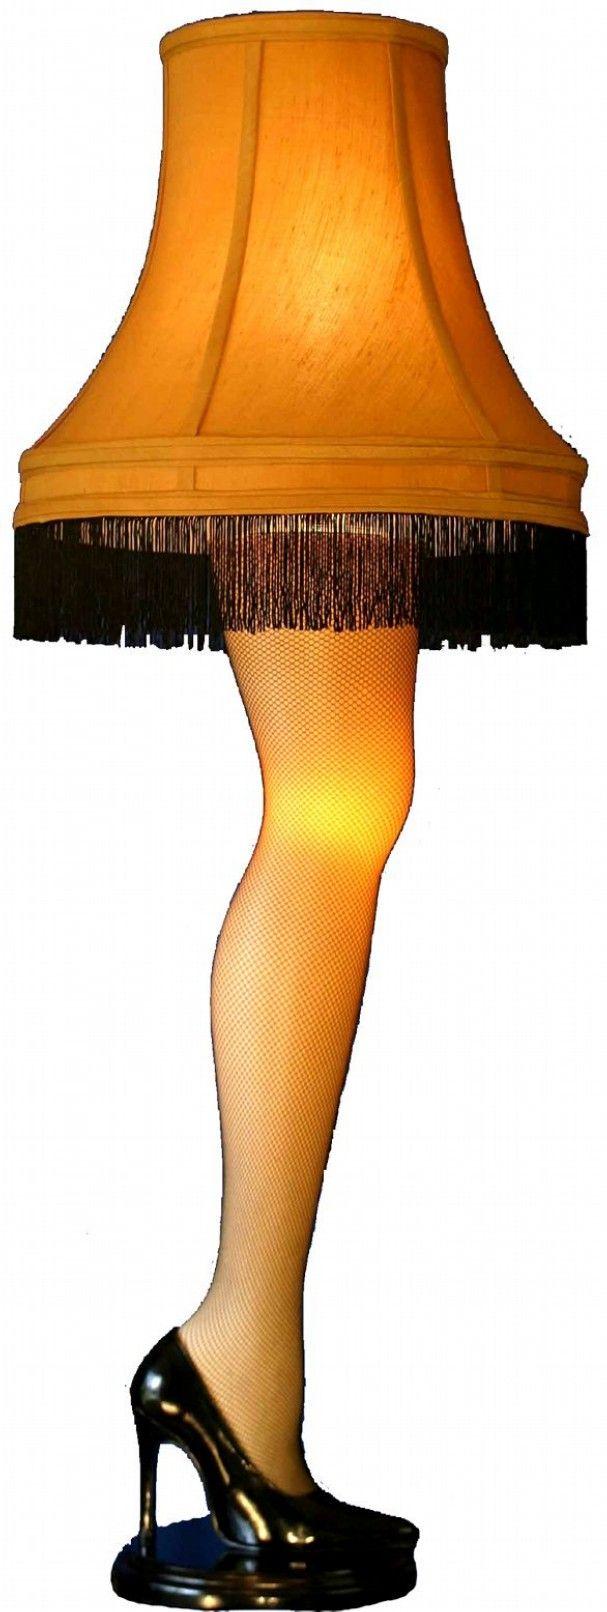 Leg Lamp Google Search Christmas Story Leg Lamp A